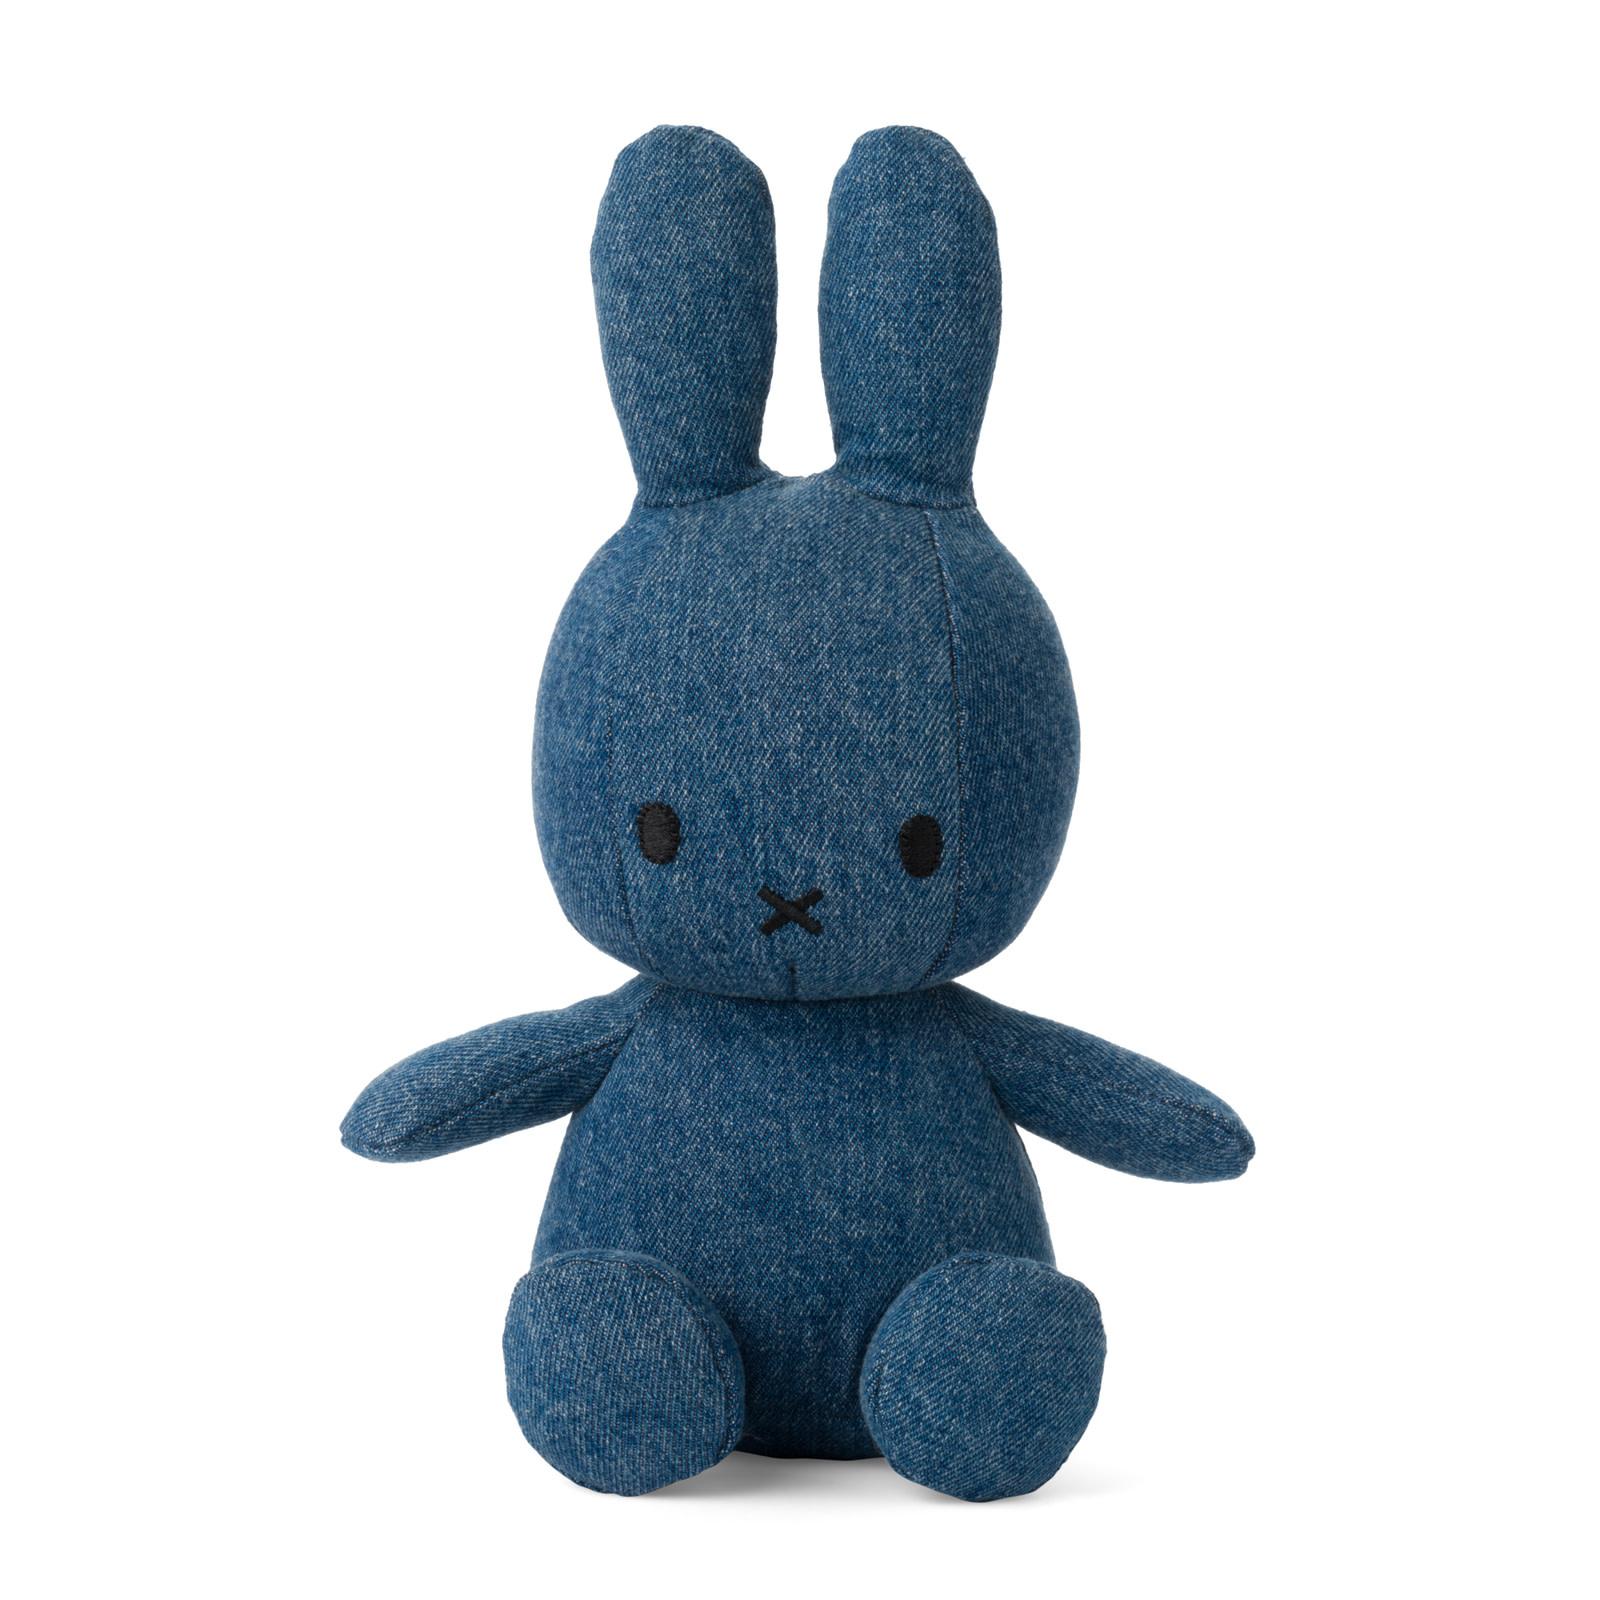 Nijntje/Miffy/Snuffy Miffy Sitting Mid Wash Denim - 23 cm